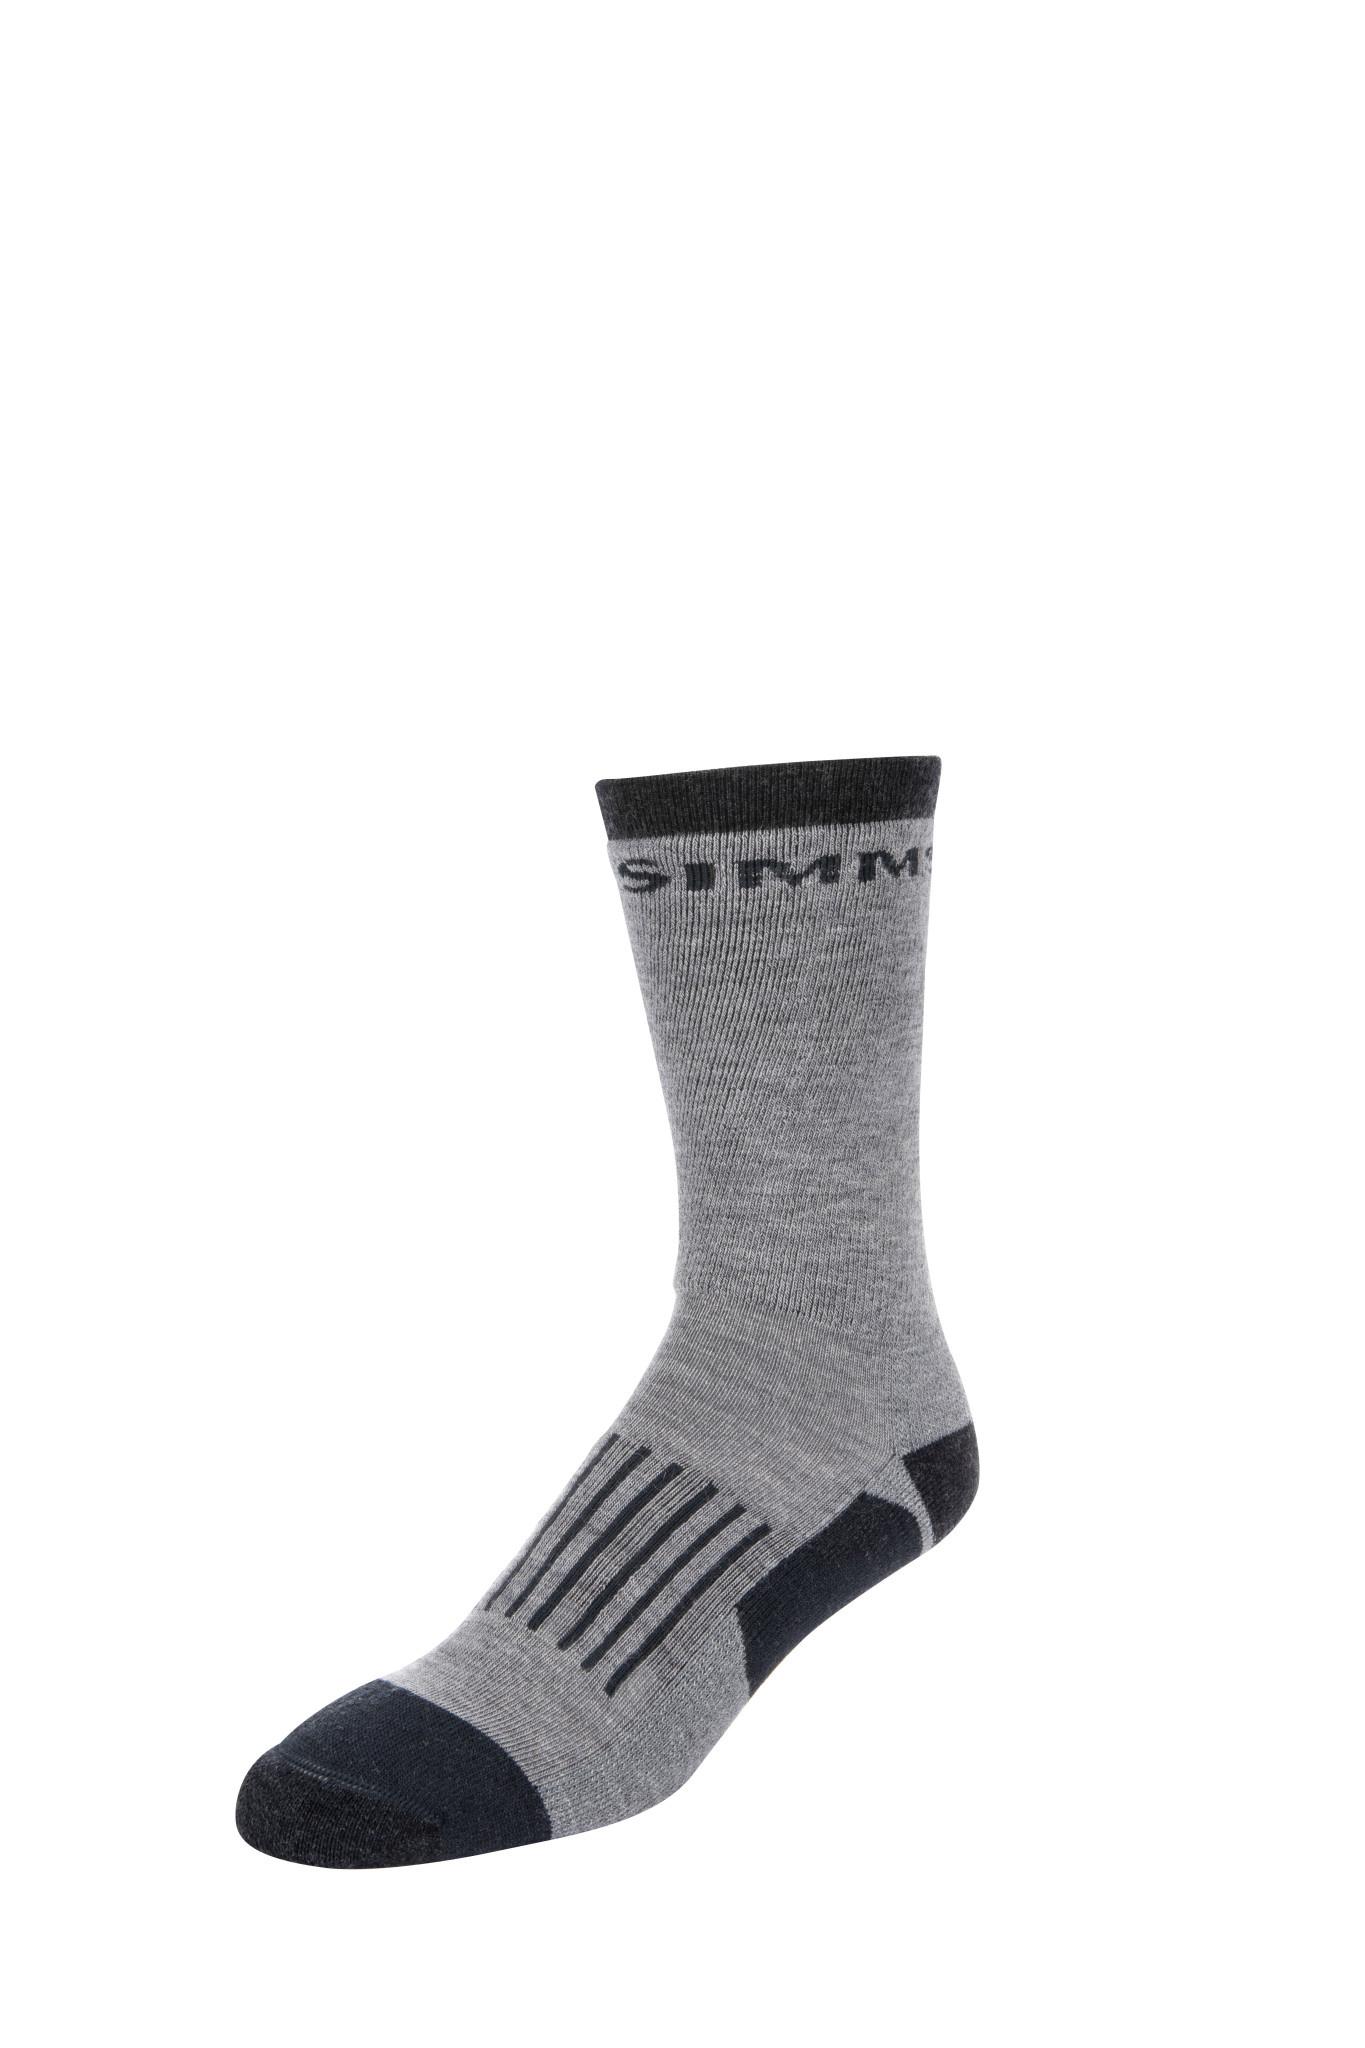 Simms Simms Merino Midweight Hiker Sock